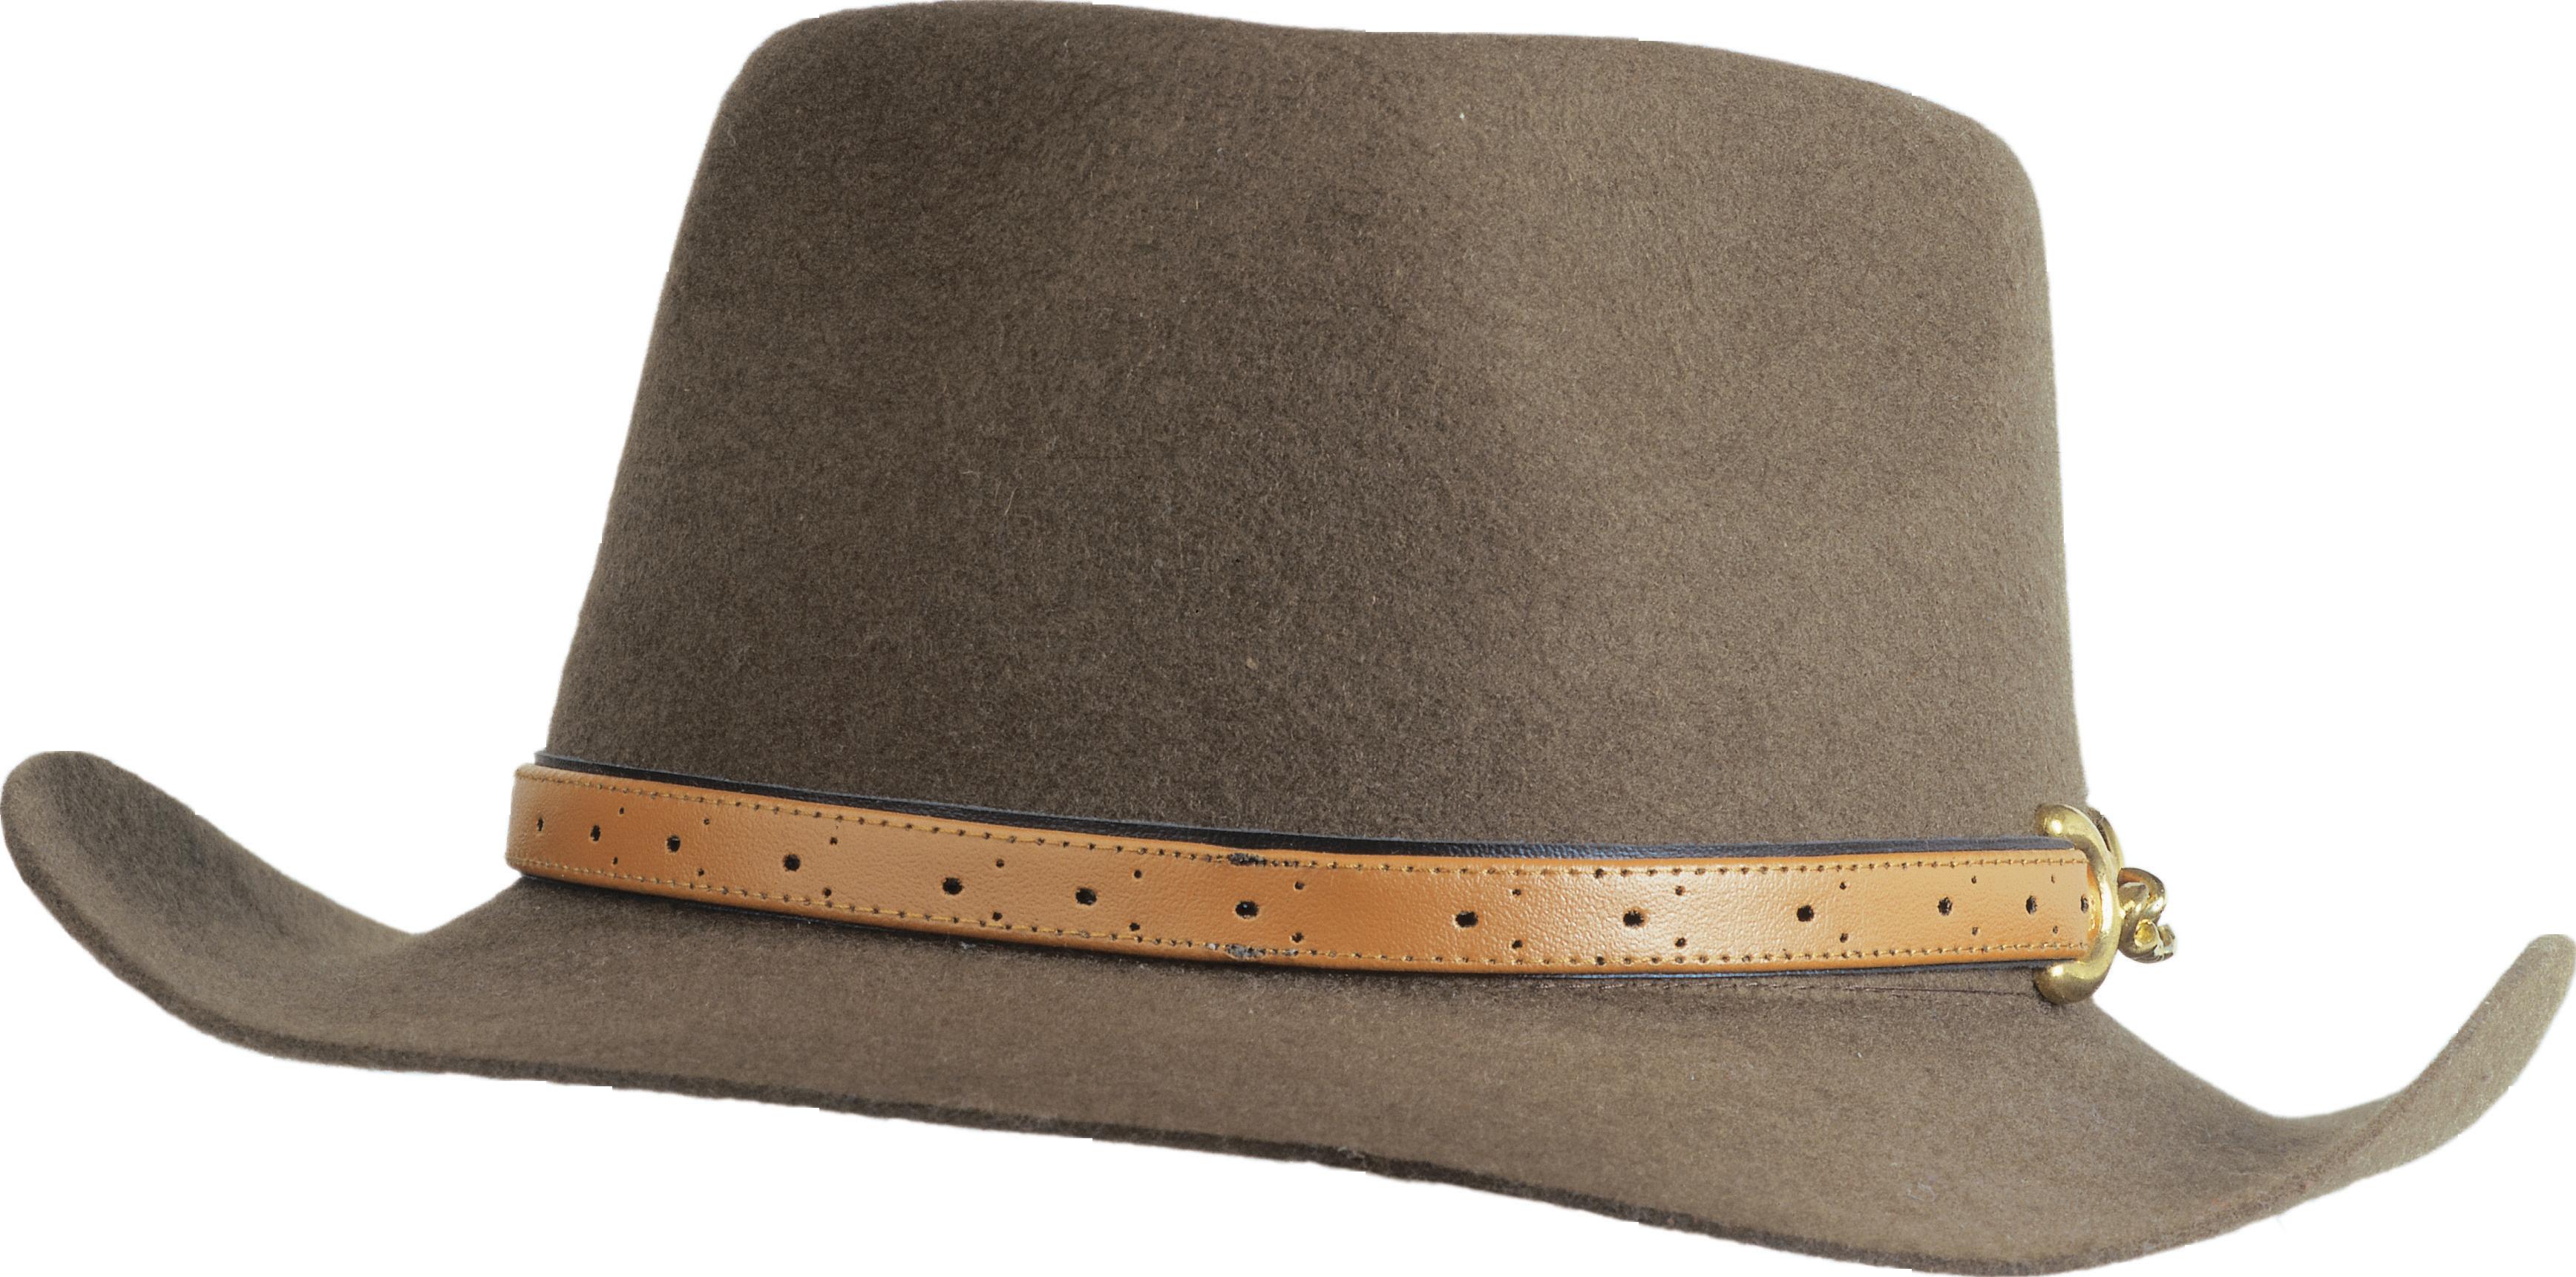 Nice Hat PNG Image